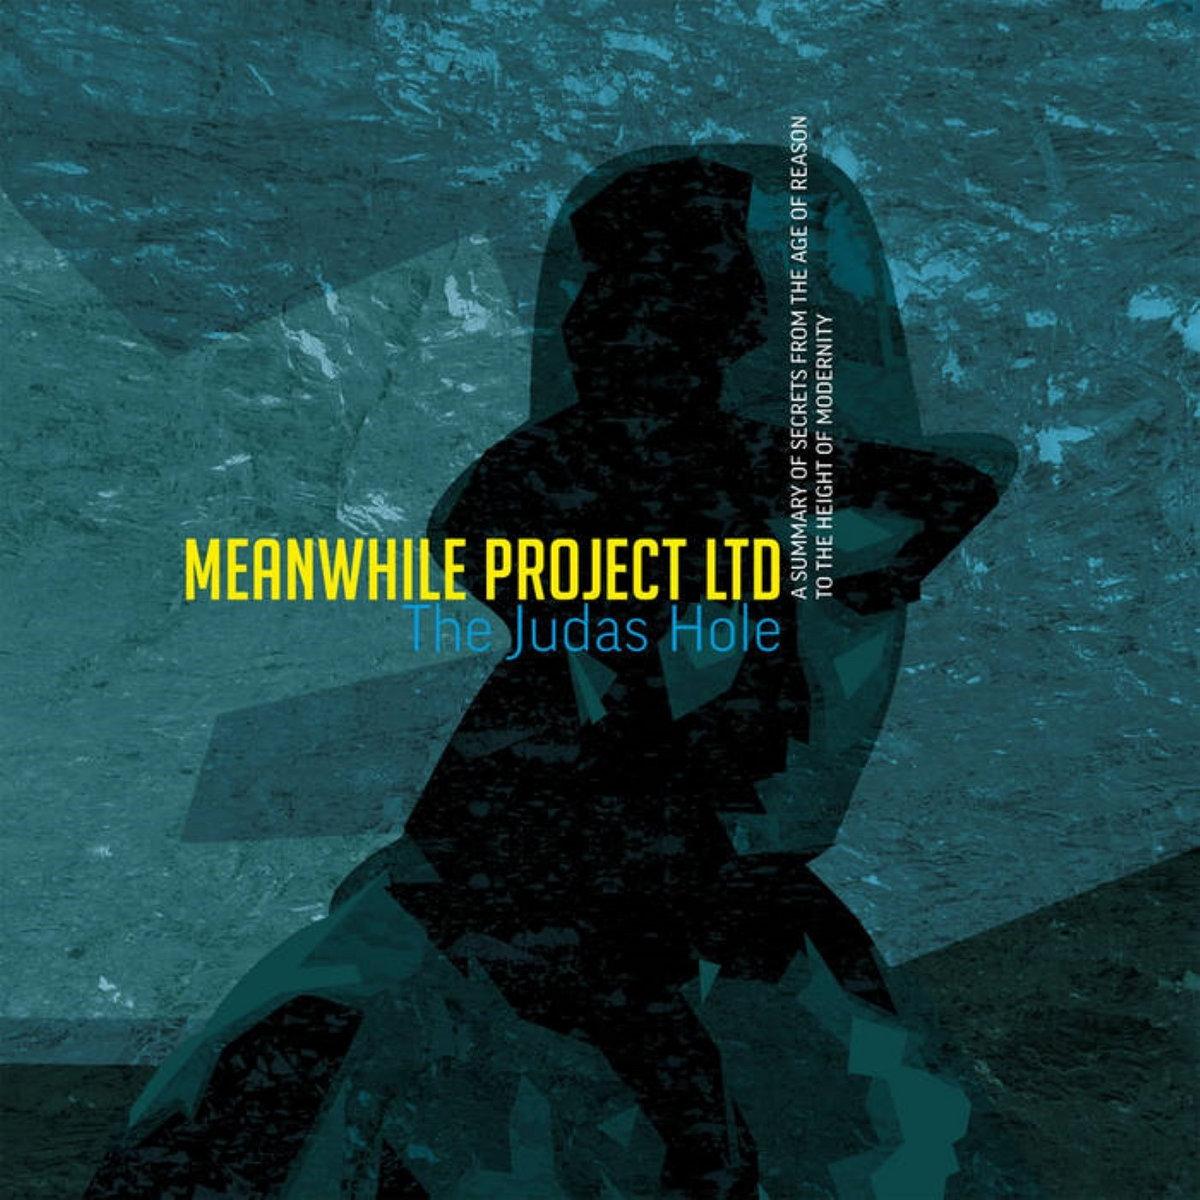 Meanwhile Project.ltd – The Judas hole